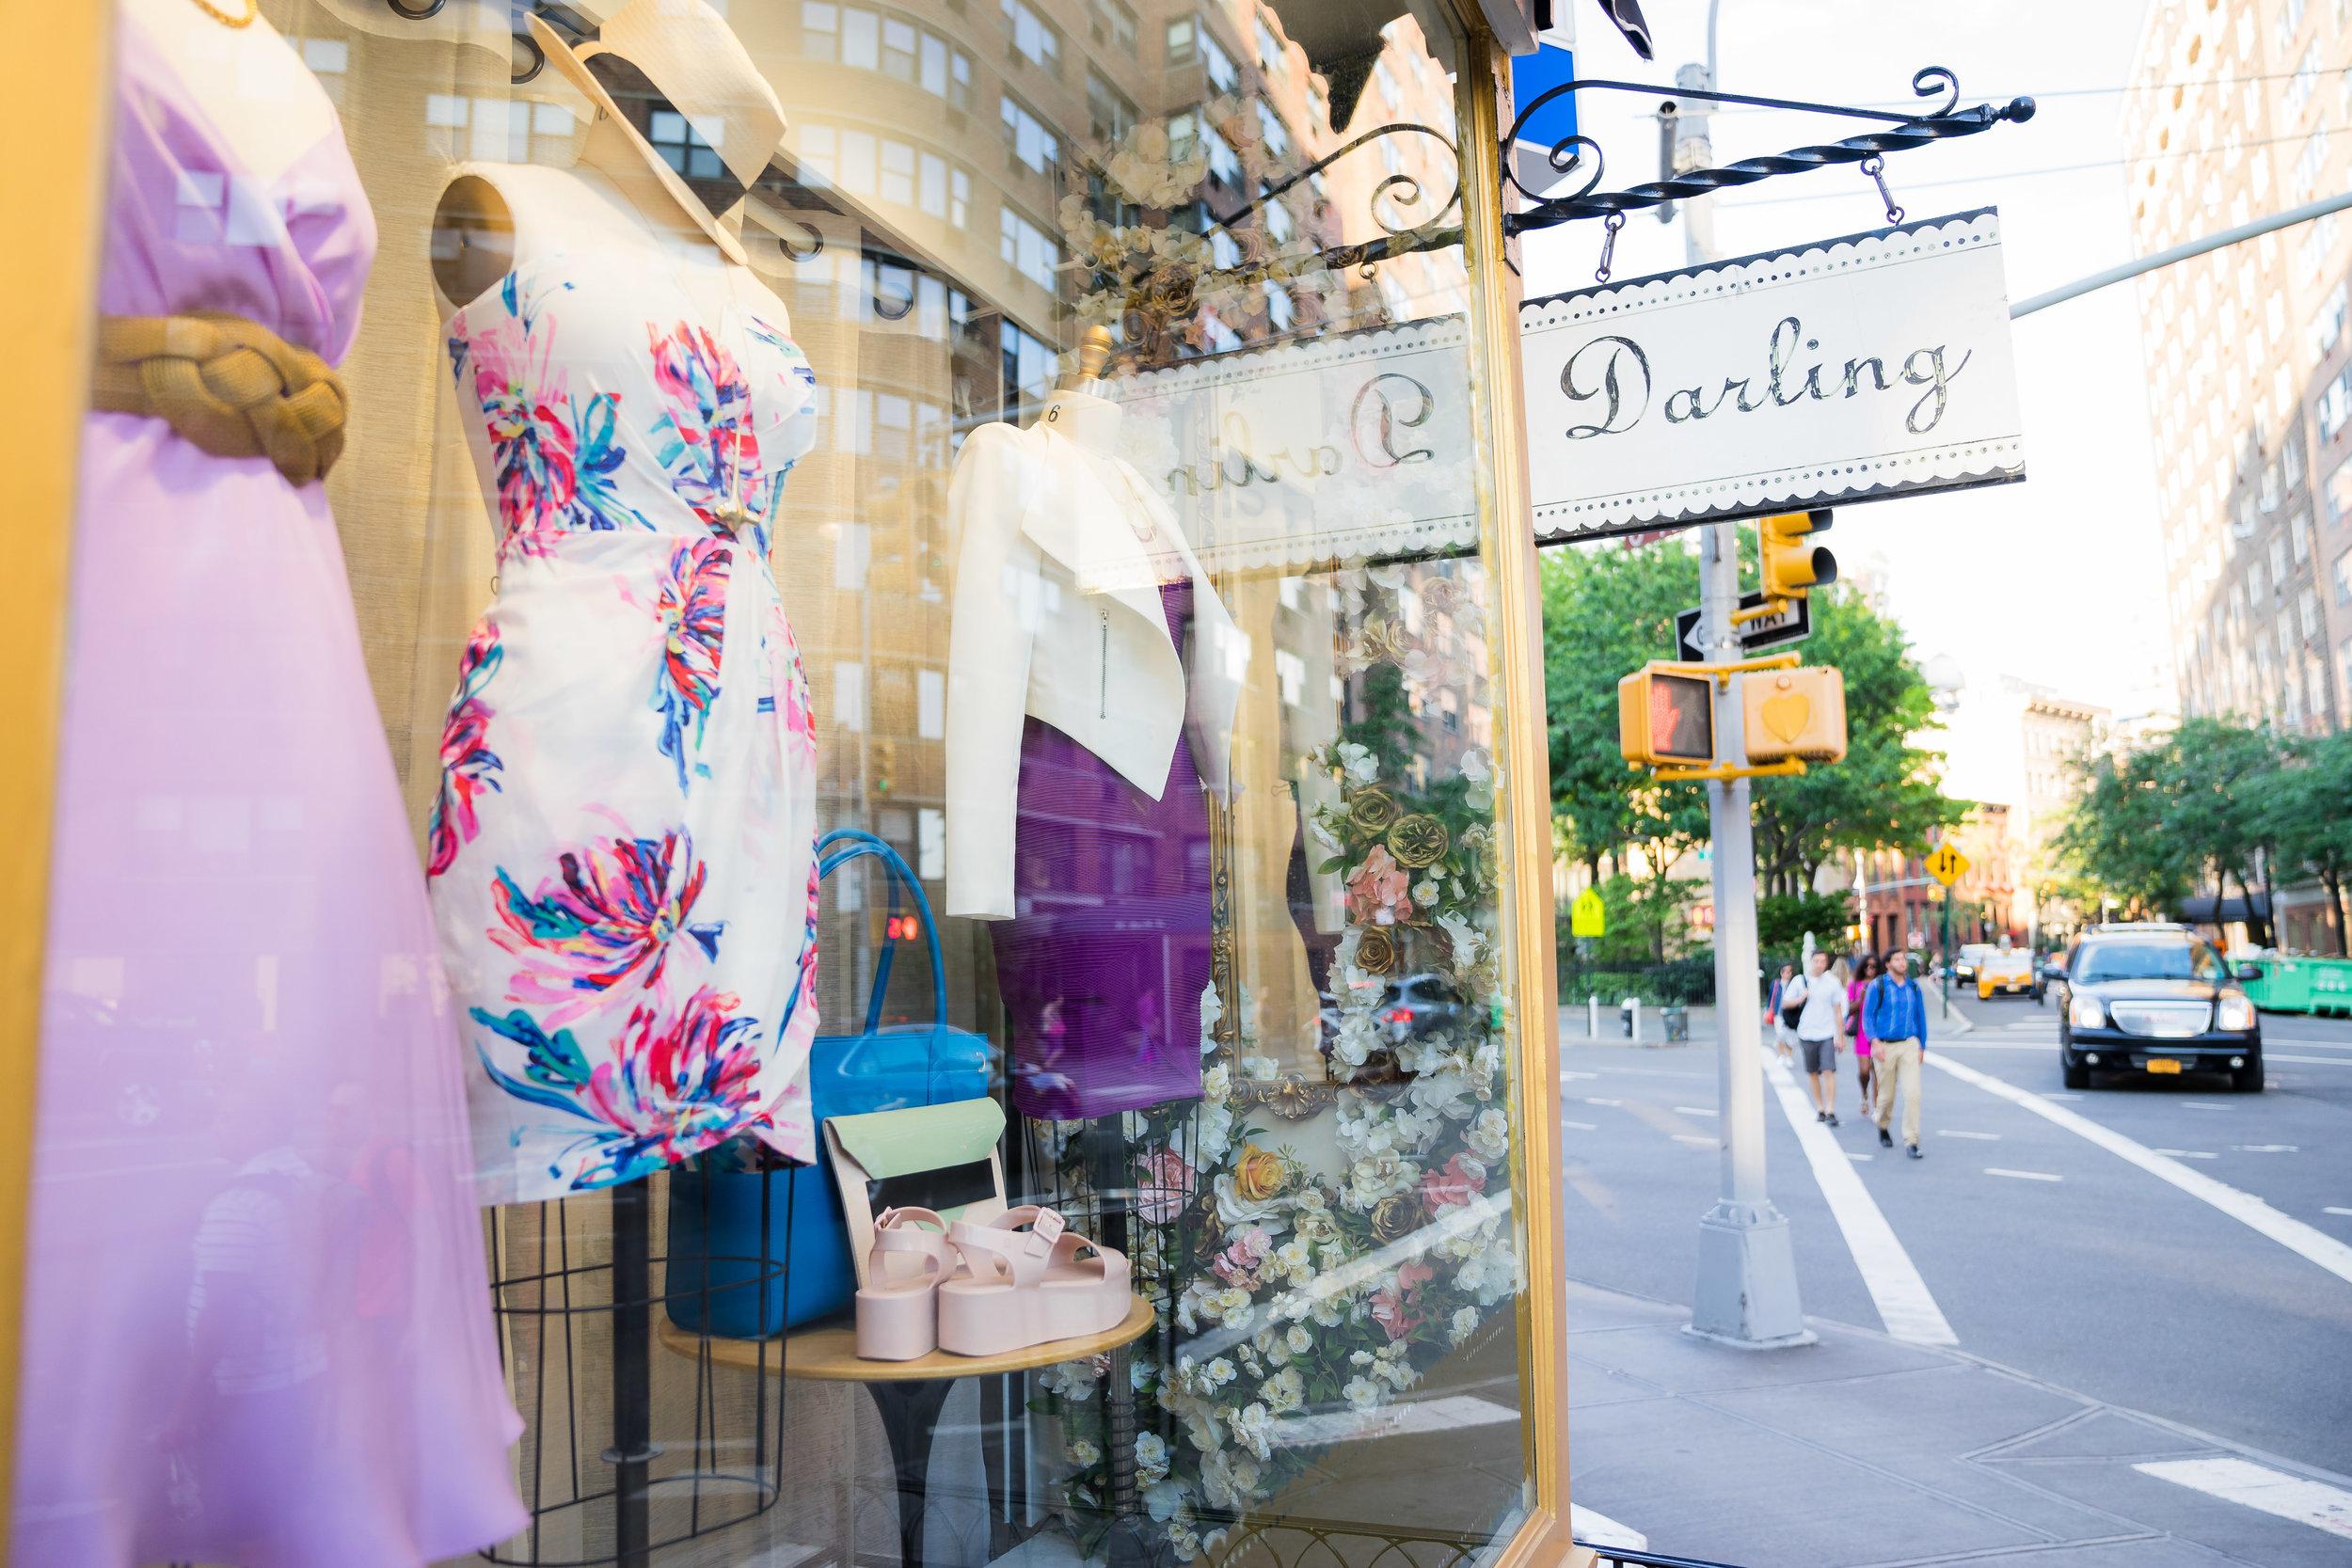 Darling_Boutique_Window_Spring.jpg